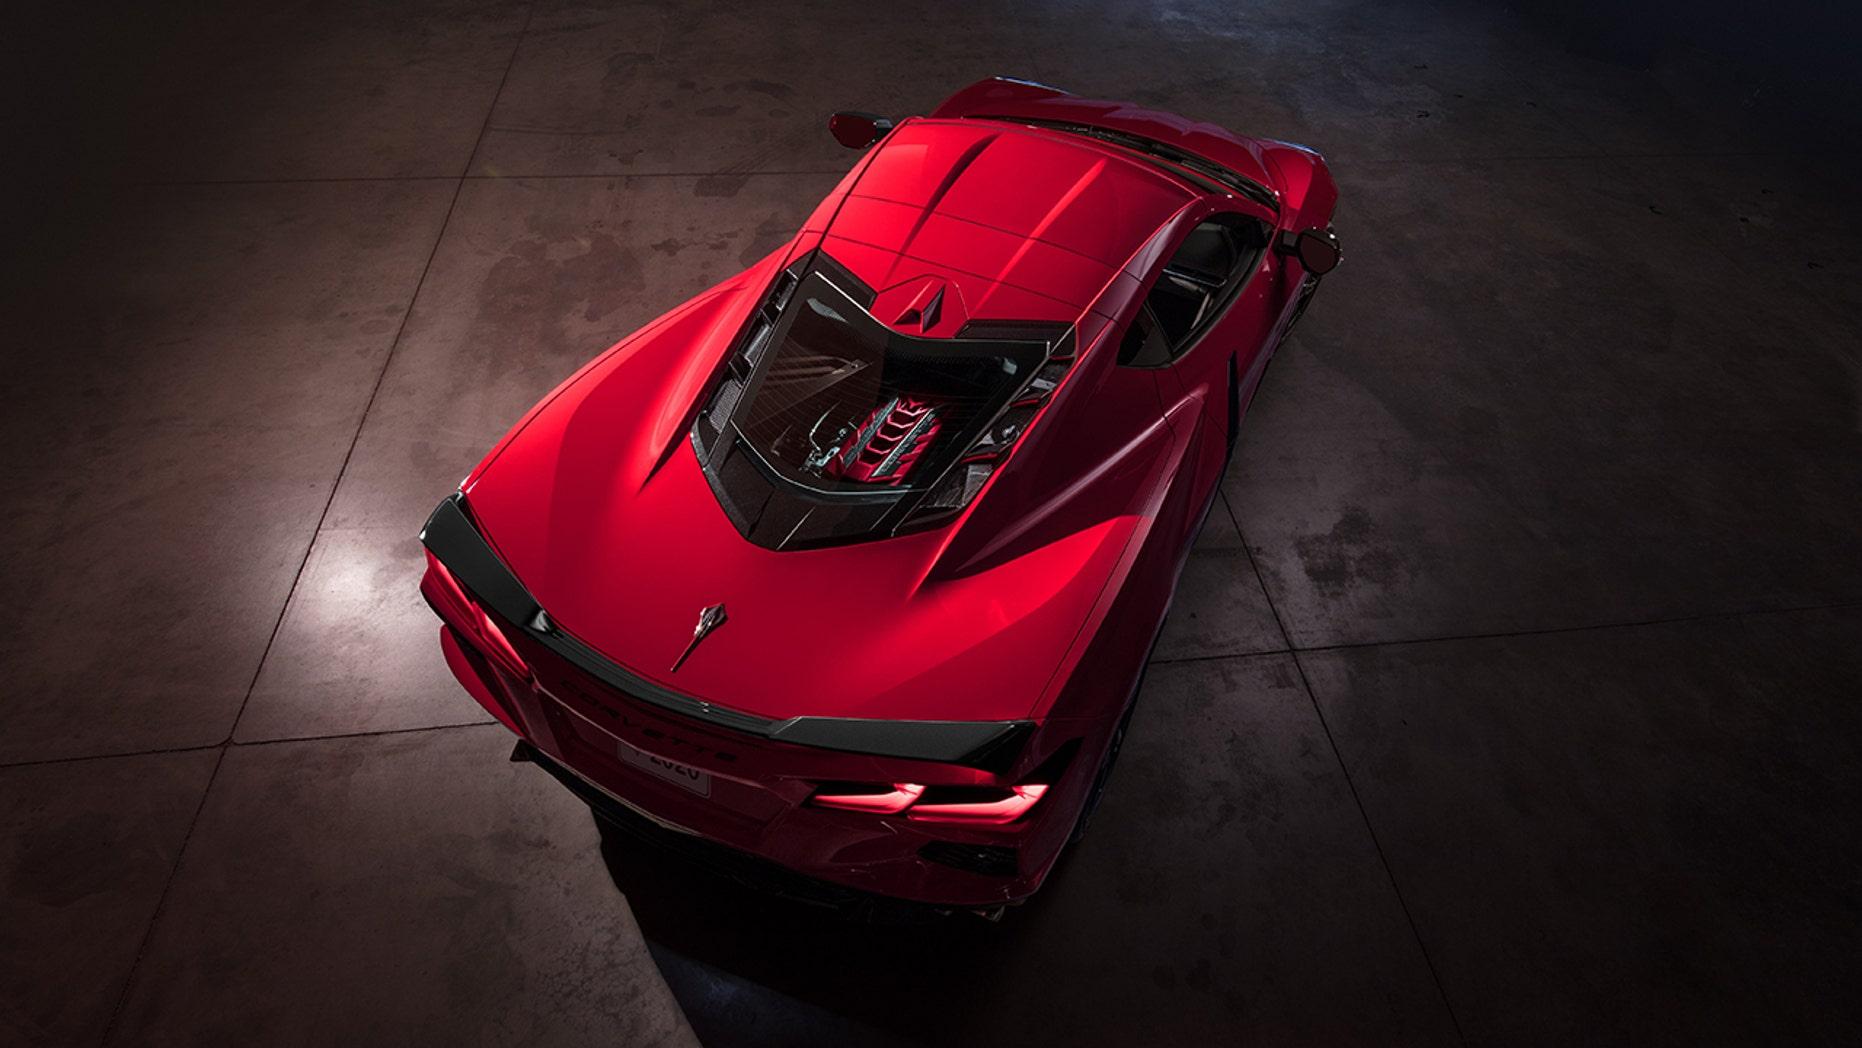 2020 Chevrolet Corvette top view